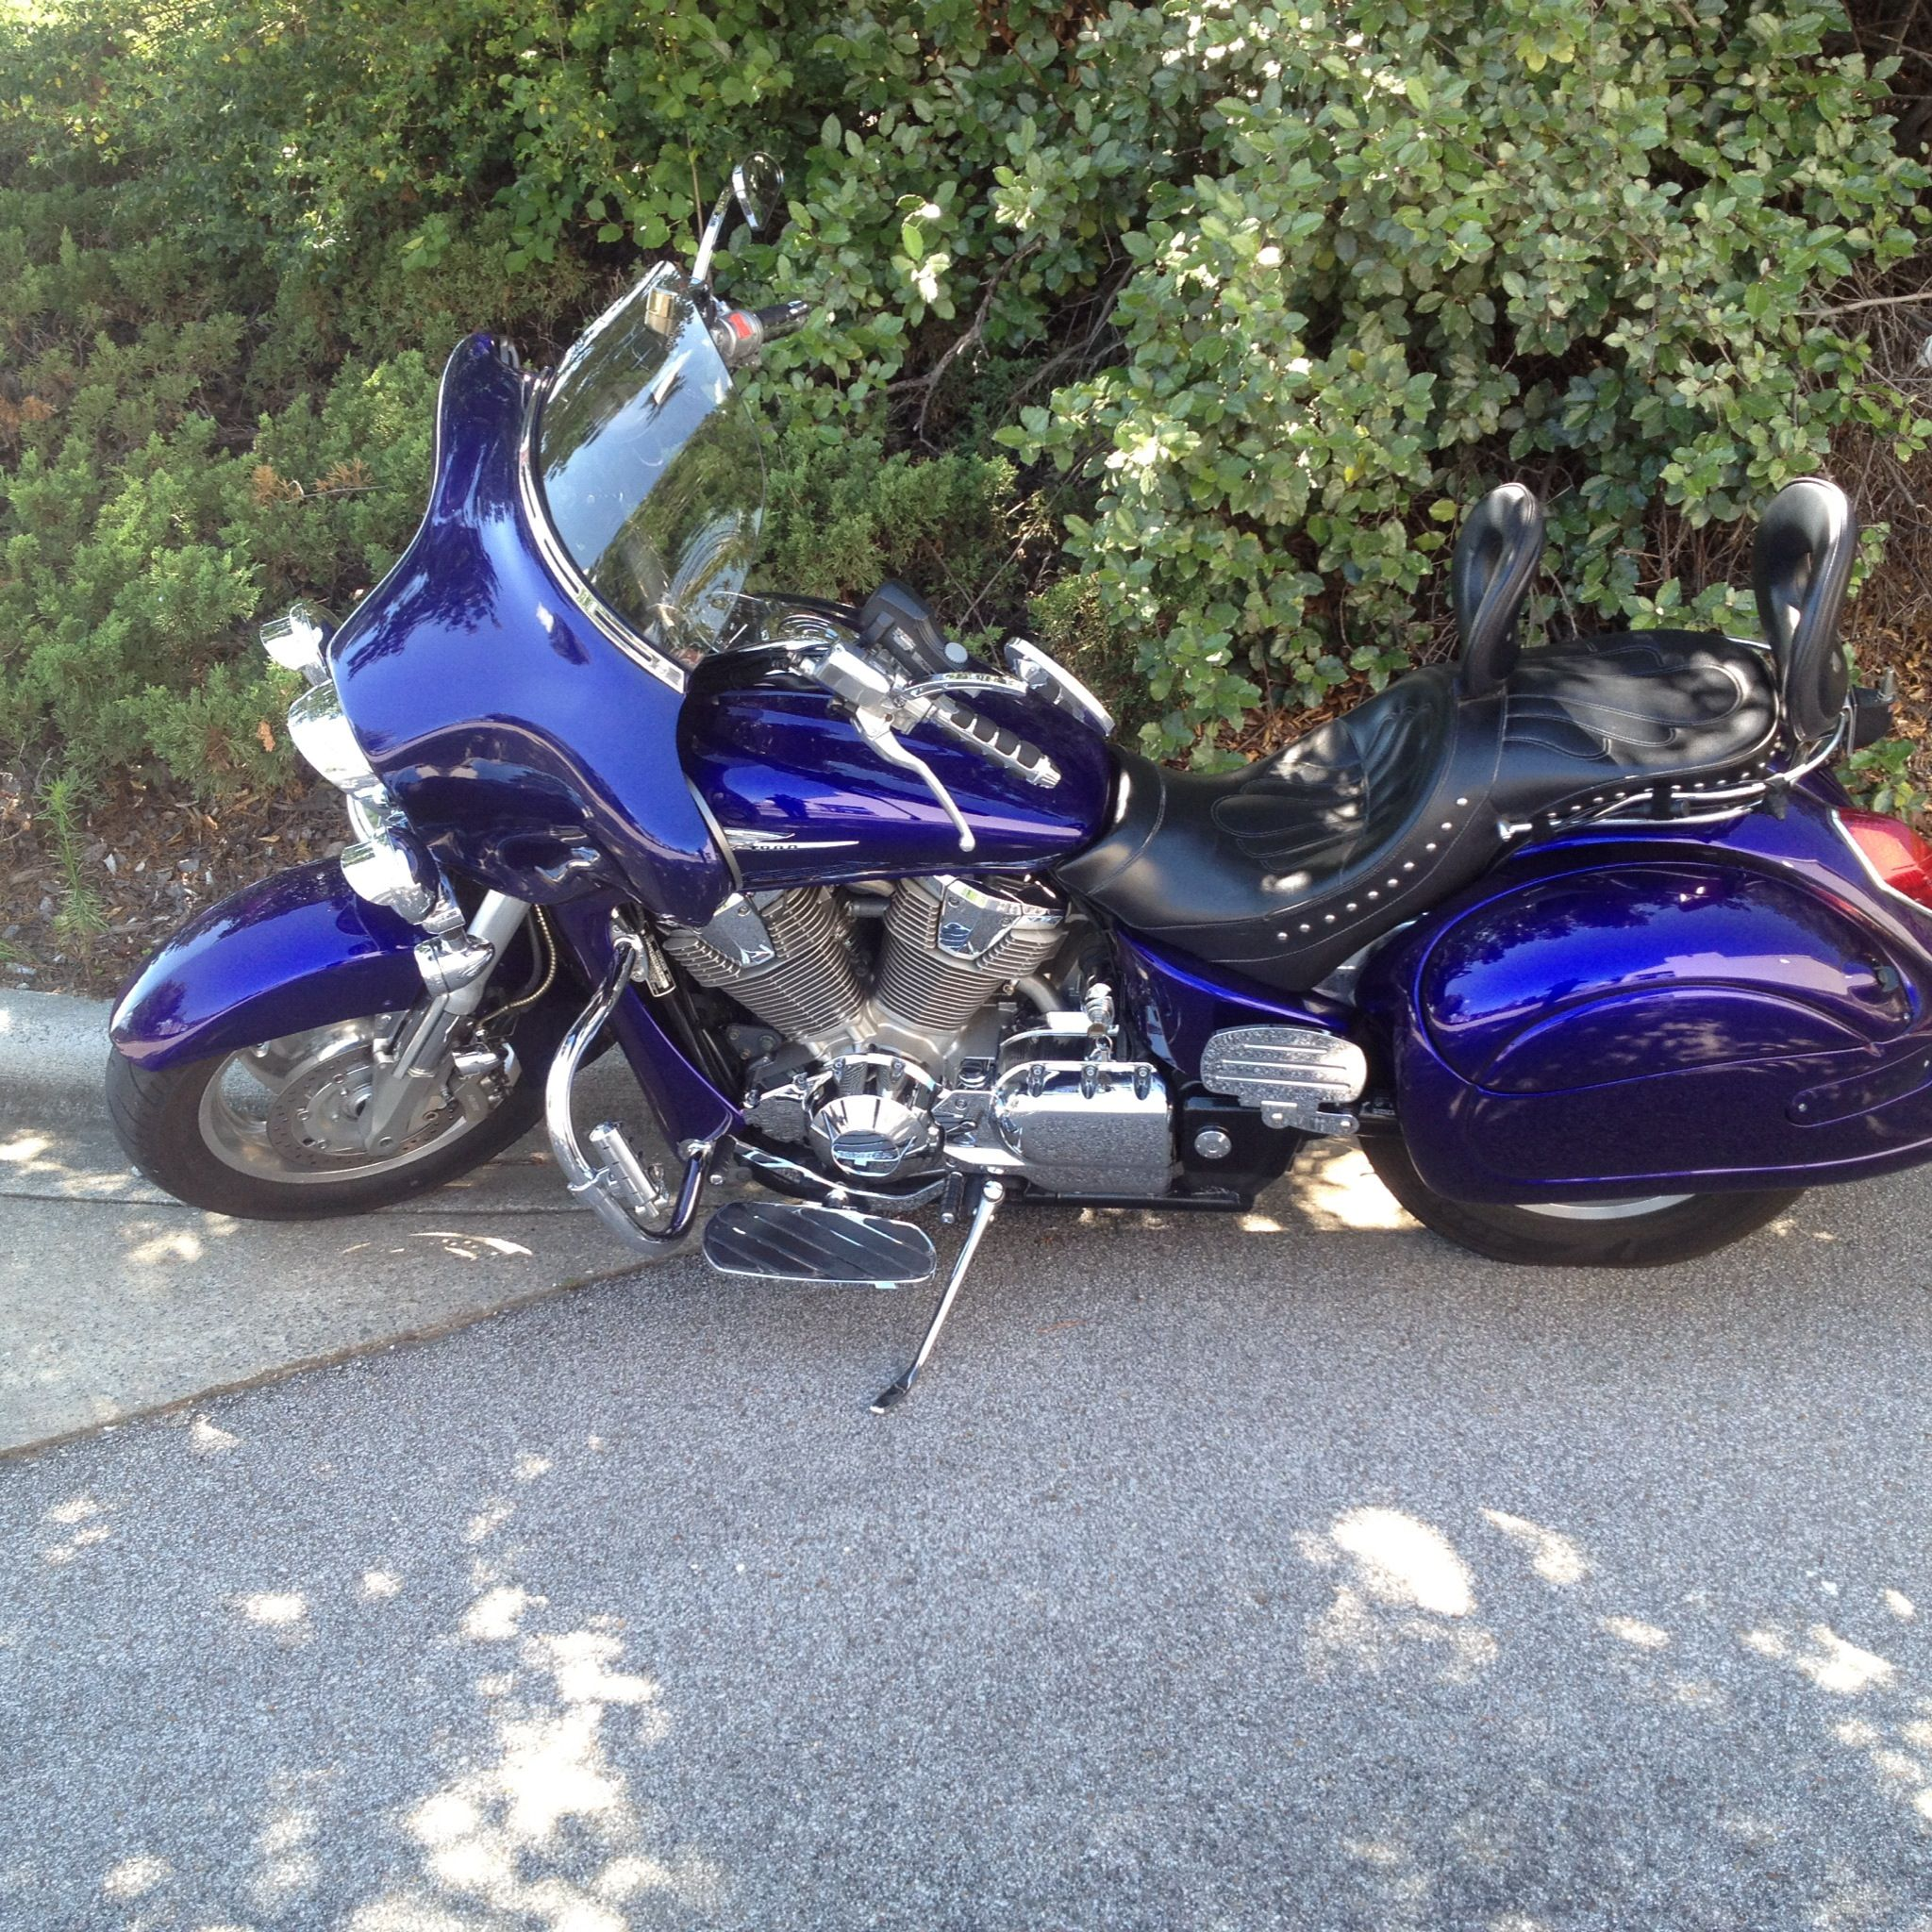 hight resolution of 2003 honda vtx 1800 retro illusion blue corbin dual tourer seat beetlebags wide open customs fairing